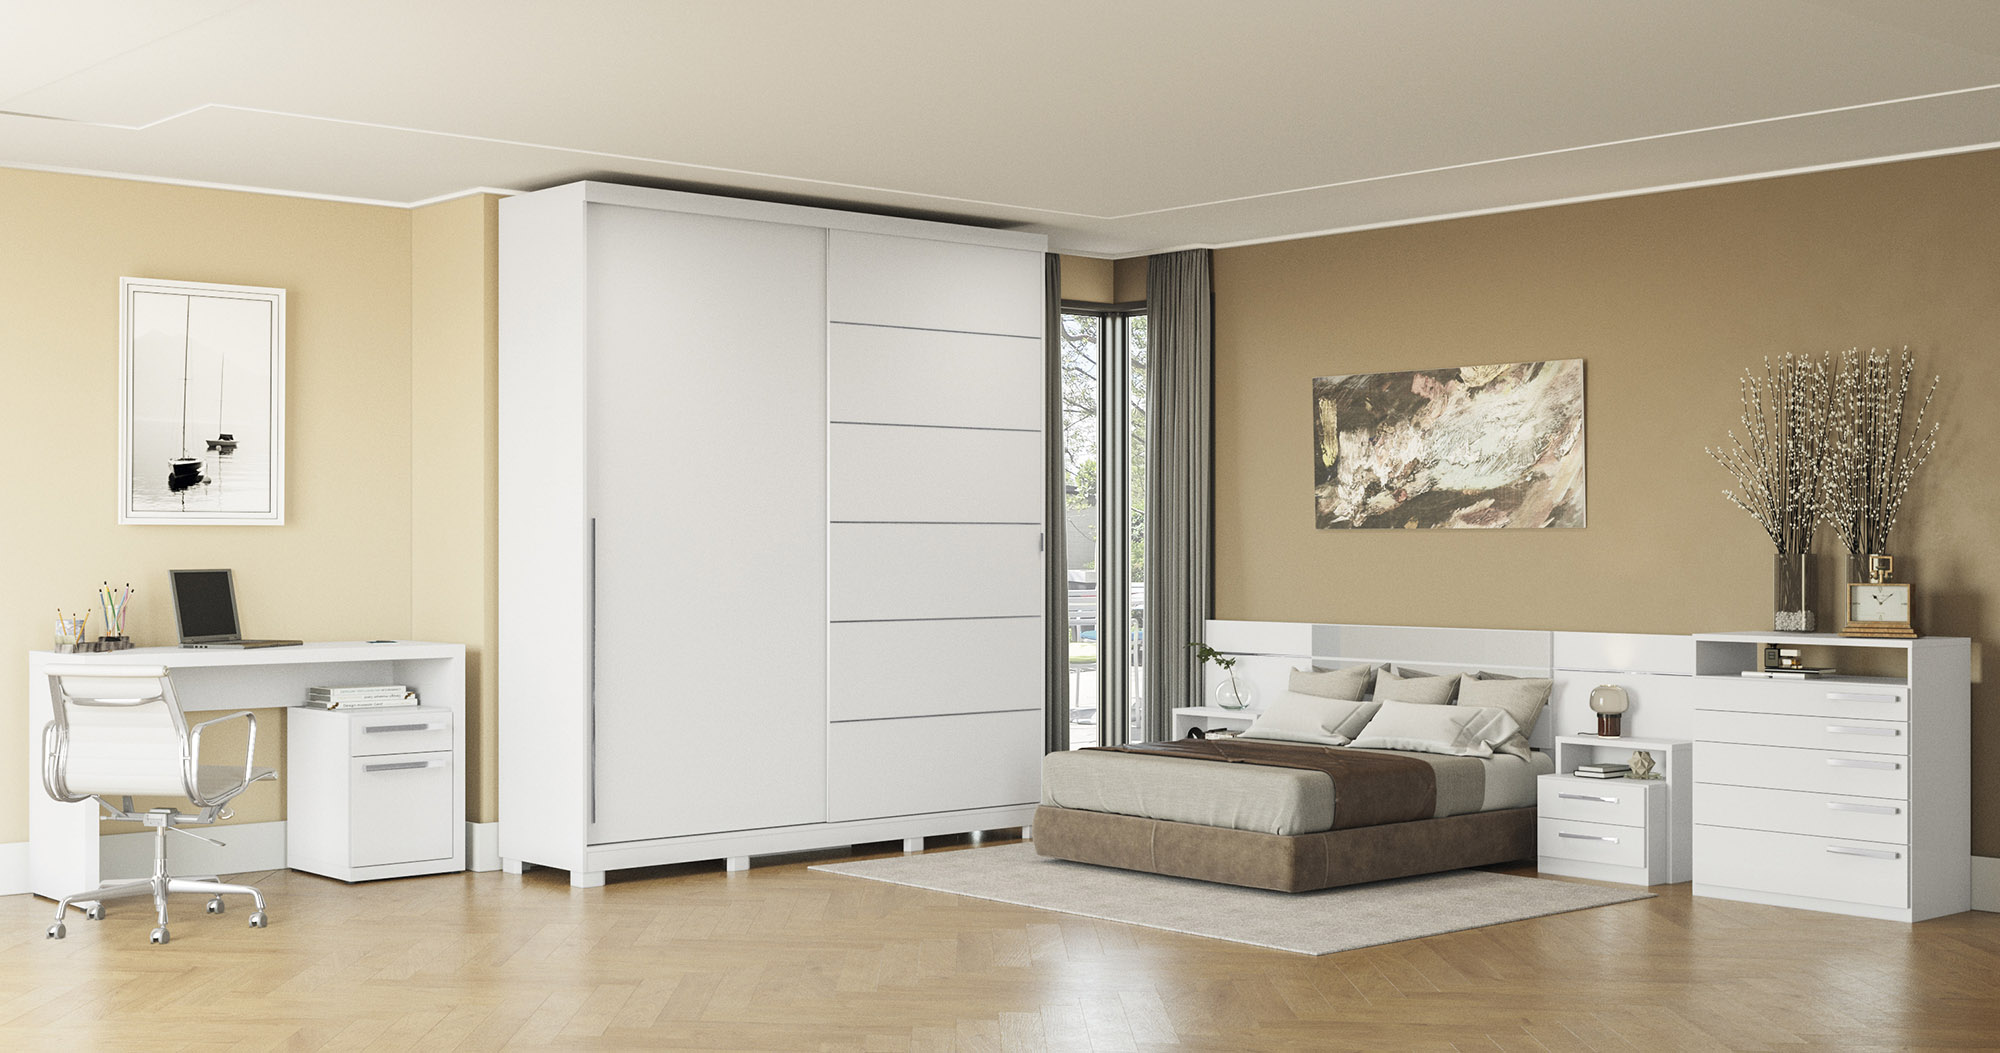 Dormitório branco